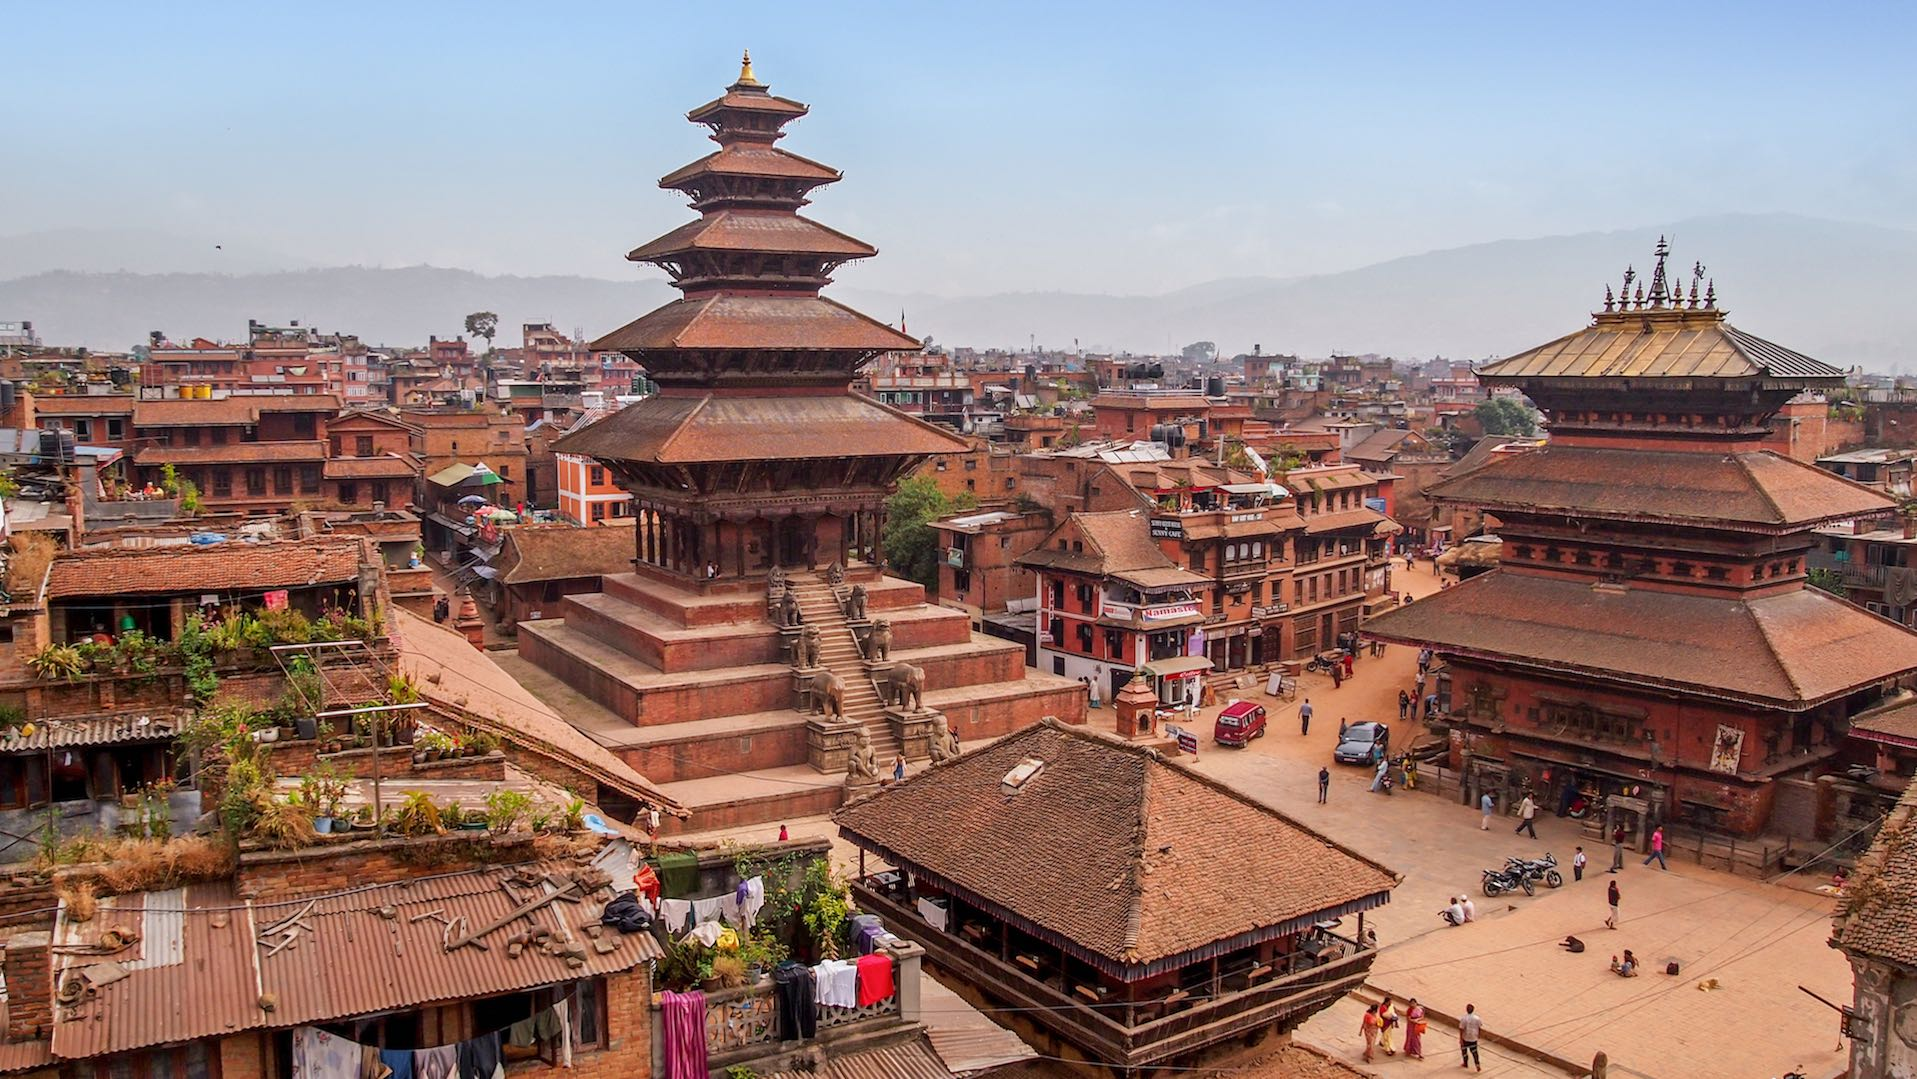 MO-HOUSE×ネパール 10周年イベント・展示会のお知らせ